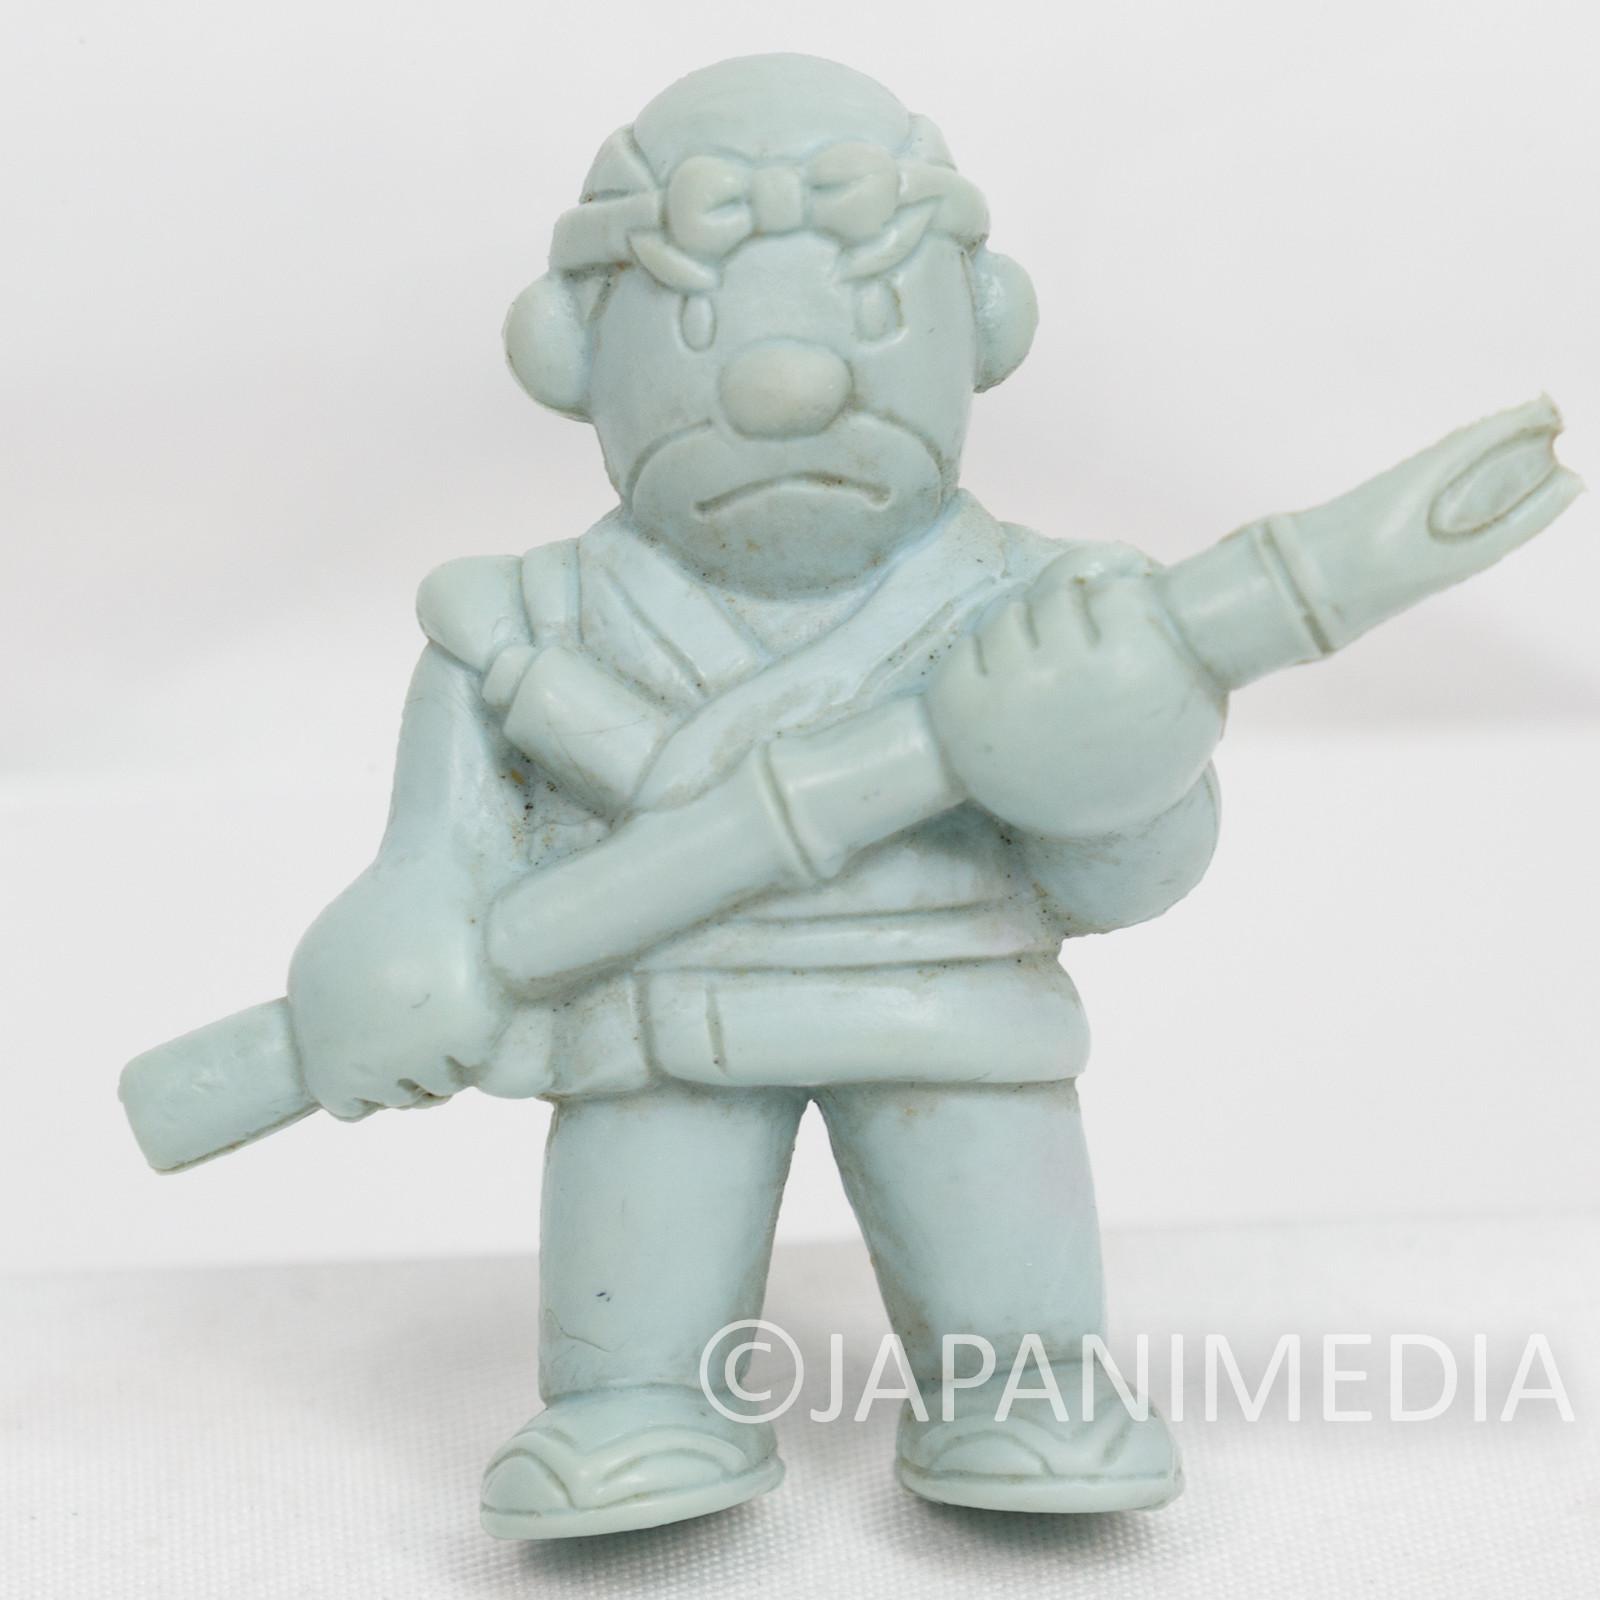 Retro RARE! Ikki Gonbe Rubber Figure Model Kit JAPAN NES FAMICOM